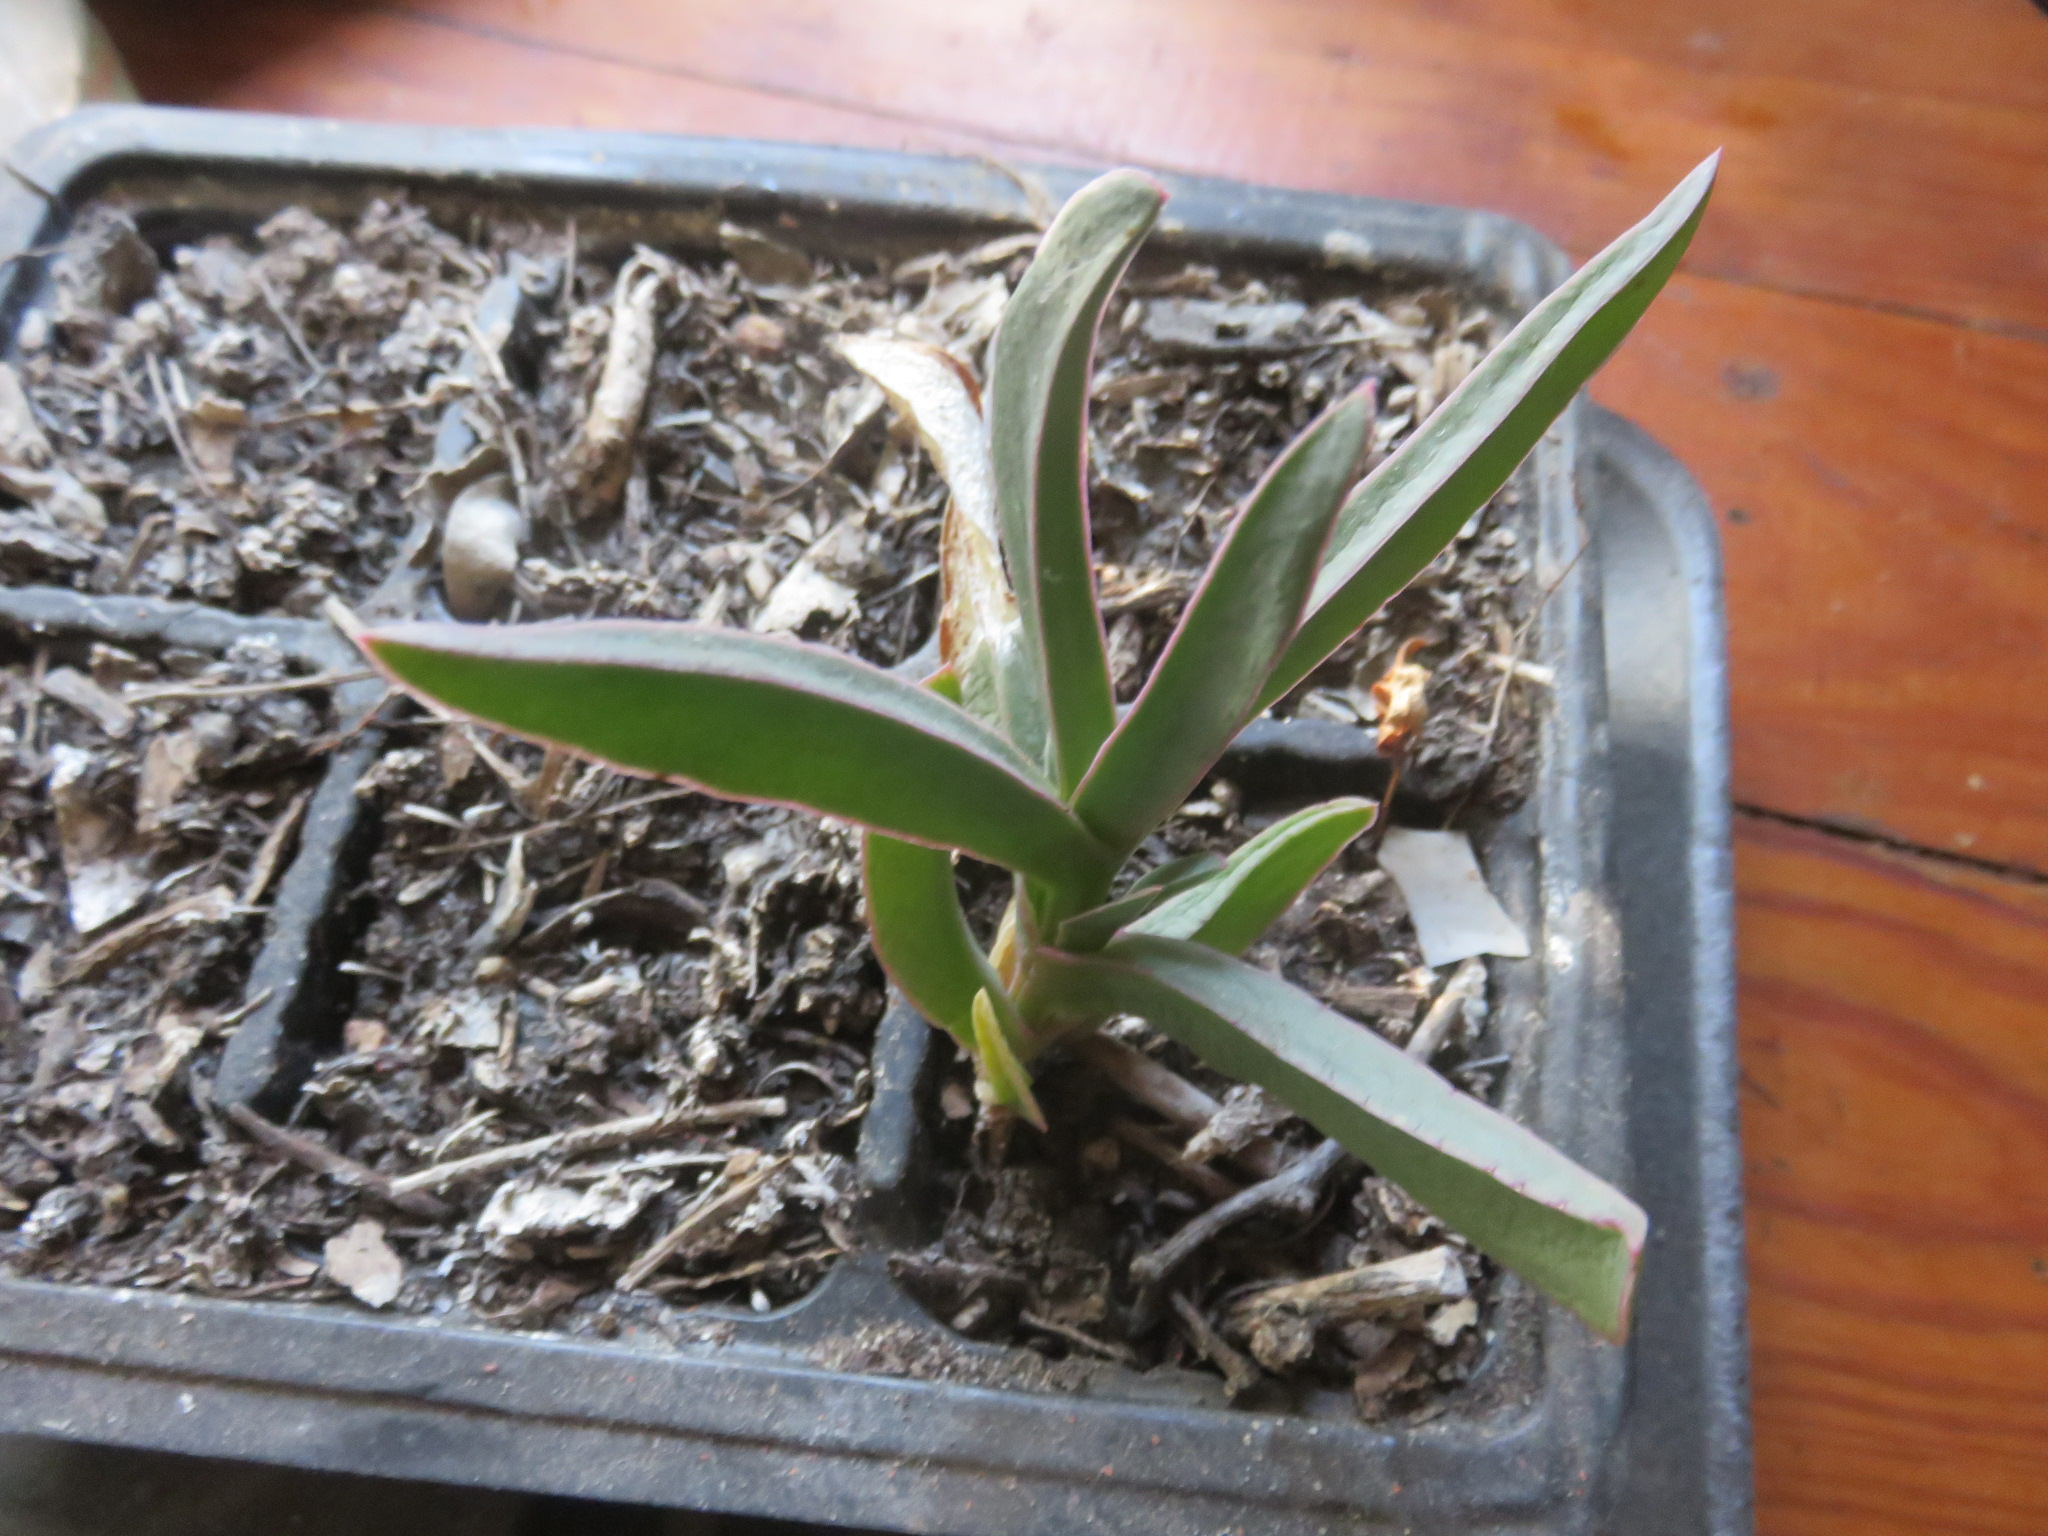 A year old Carpobrotus seedling